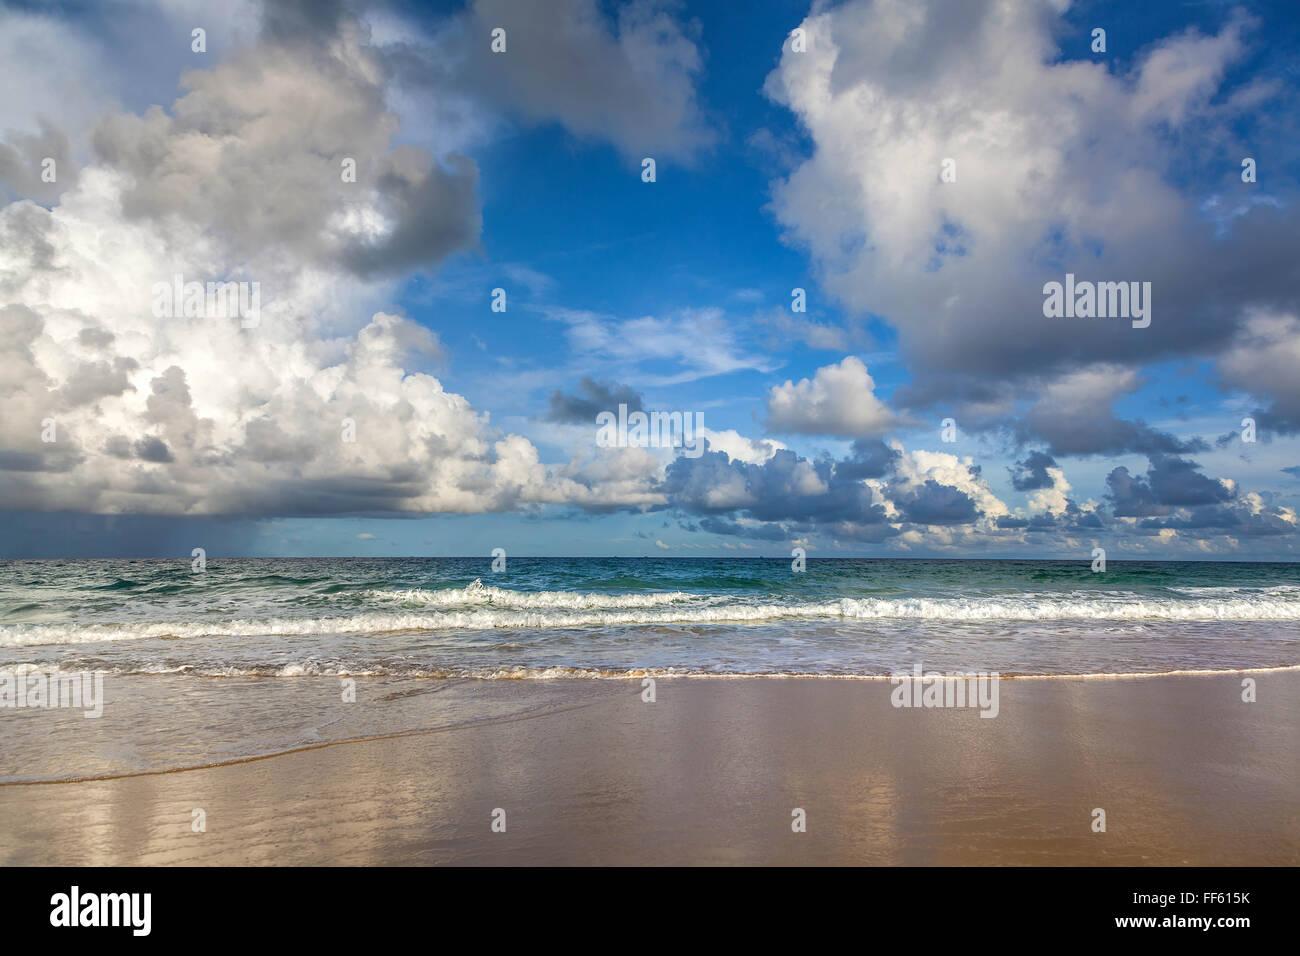 Sunrise on Karon Beach. Thai island of Phuket - Stock Image